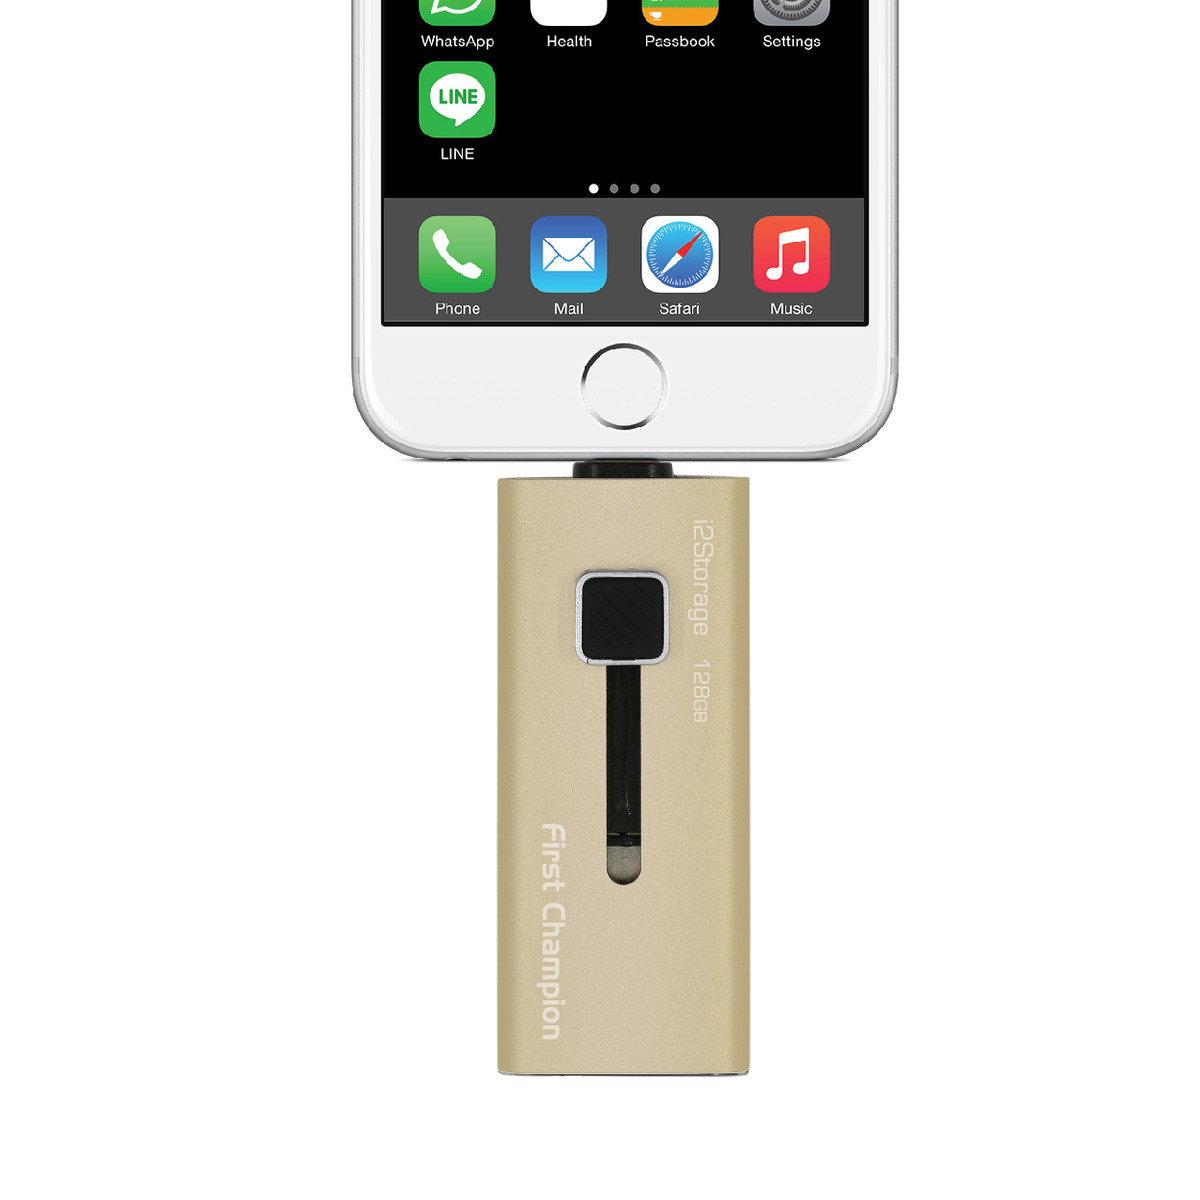 蘋果專用Lightning USB 3.0 隨身碟 i2S30-128GB